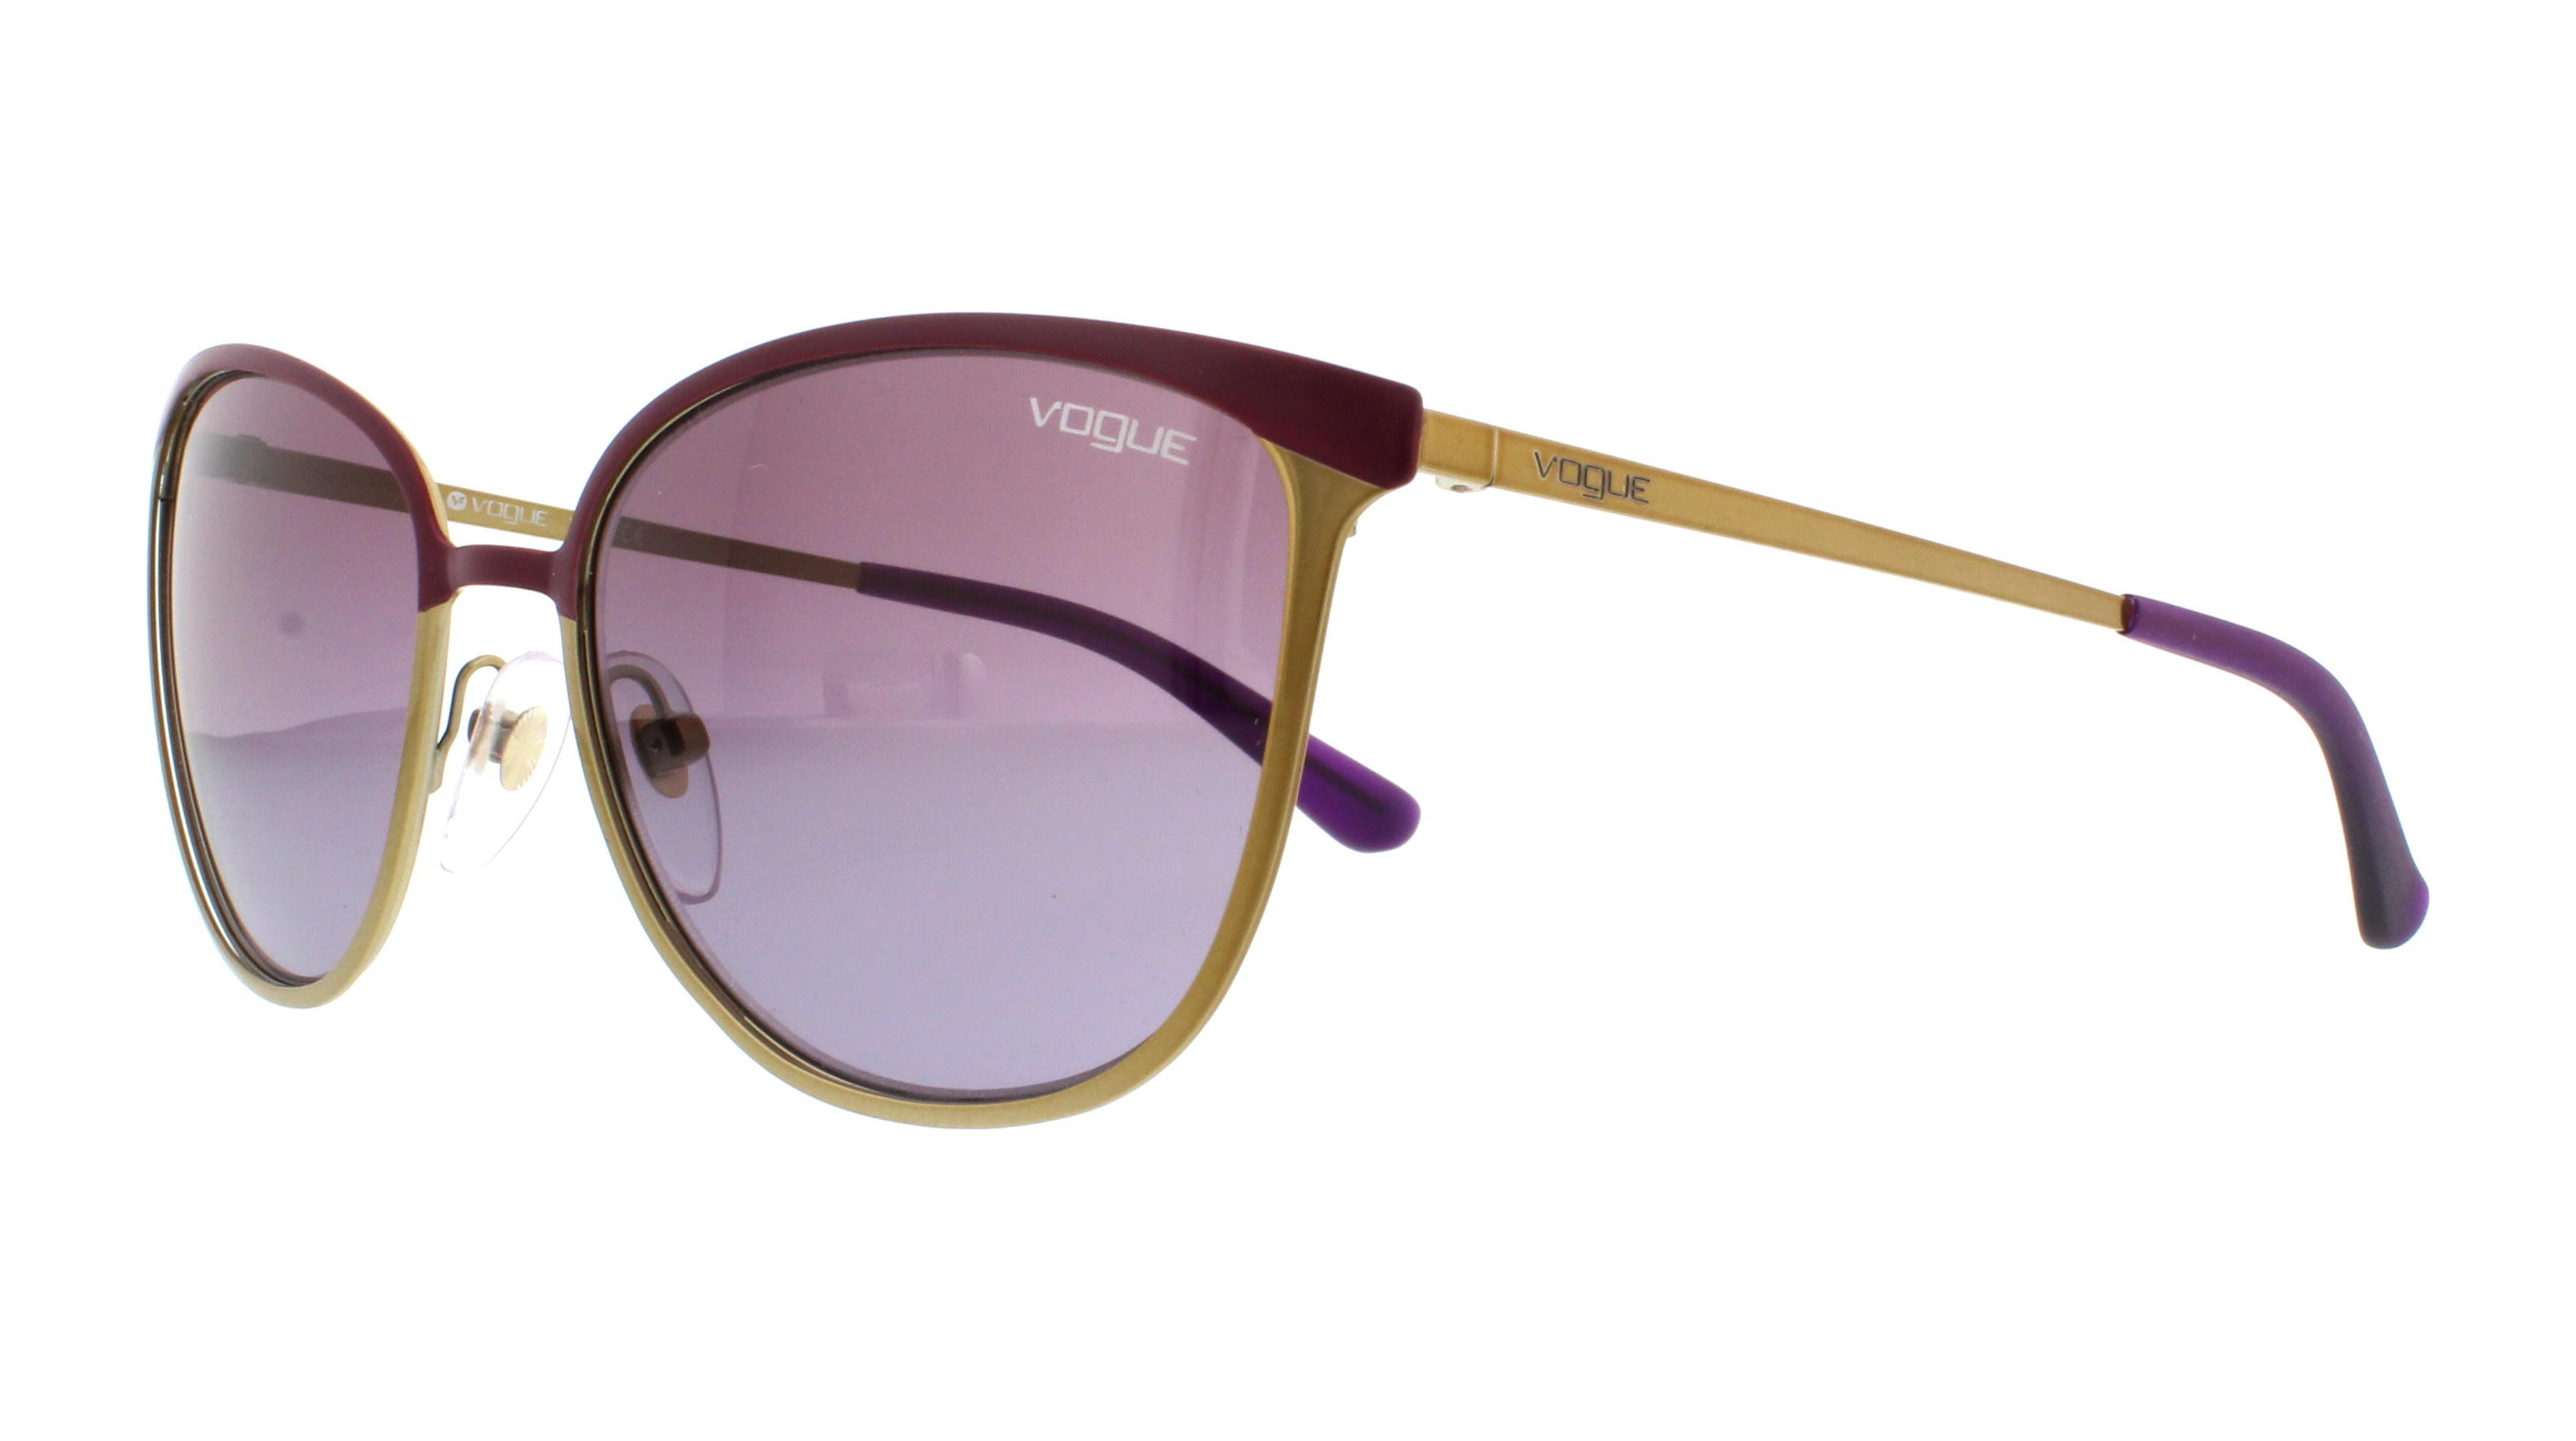 Womens Sunglasses Vogue k9jhIr